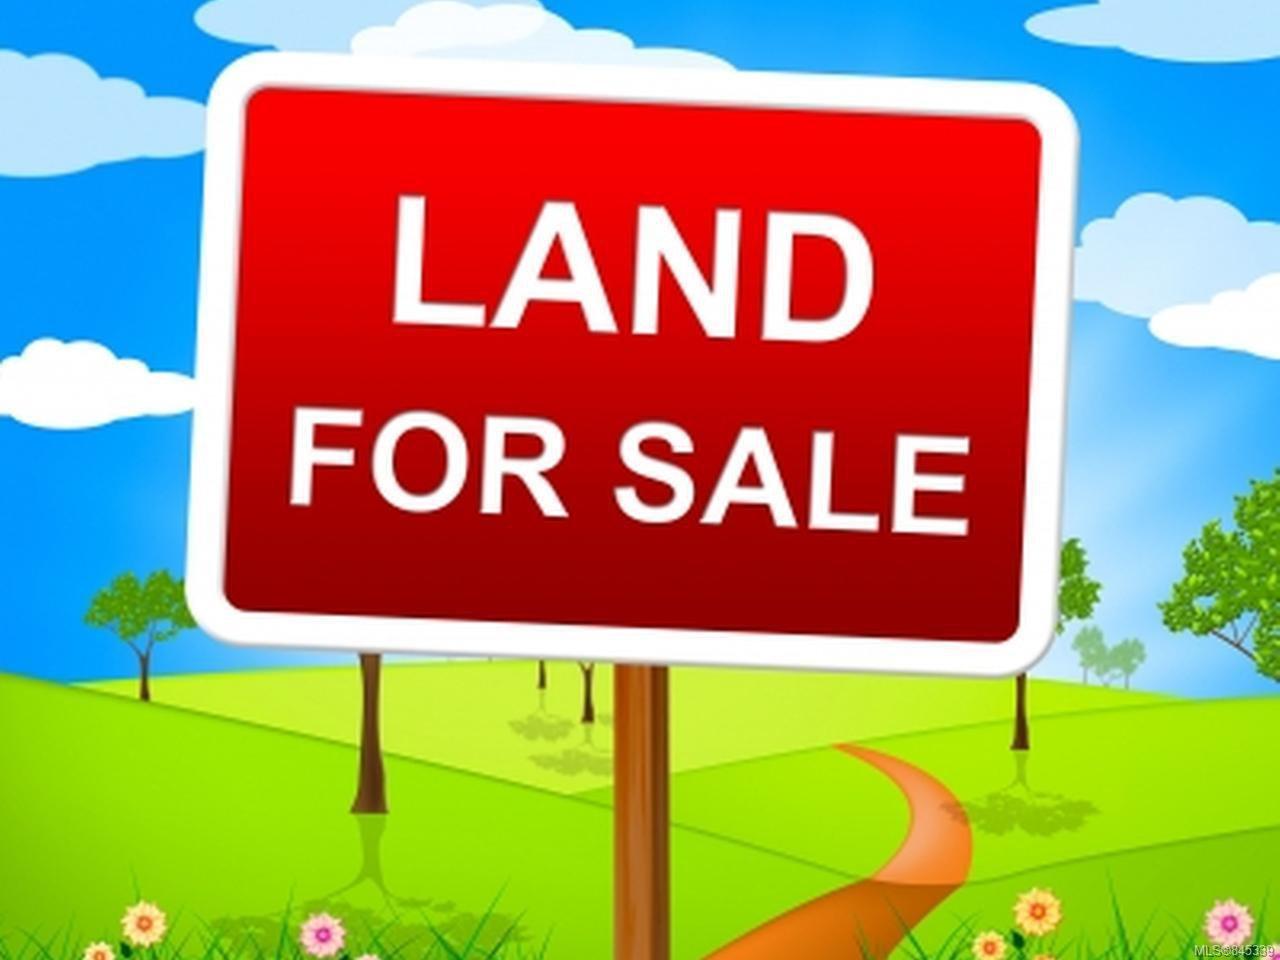 Main Photo: LT 1 E Ryan Rd in COMOX: CV Comox Peninsula Land for sale (Comox Valley)  : MLS®# 845339